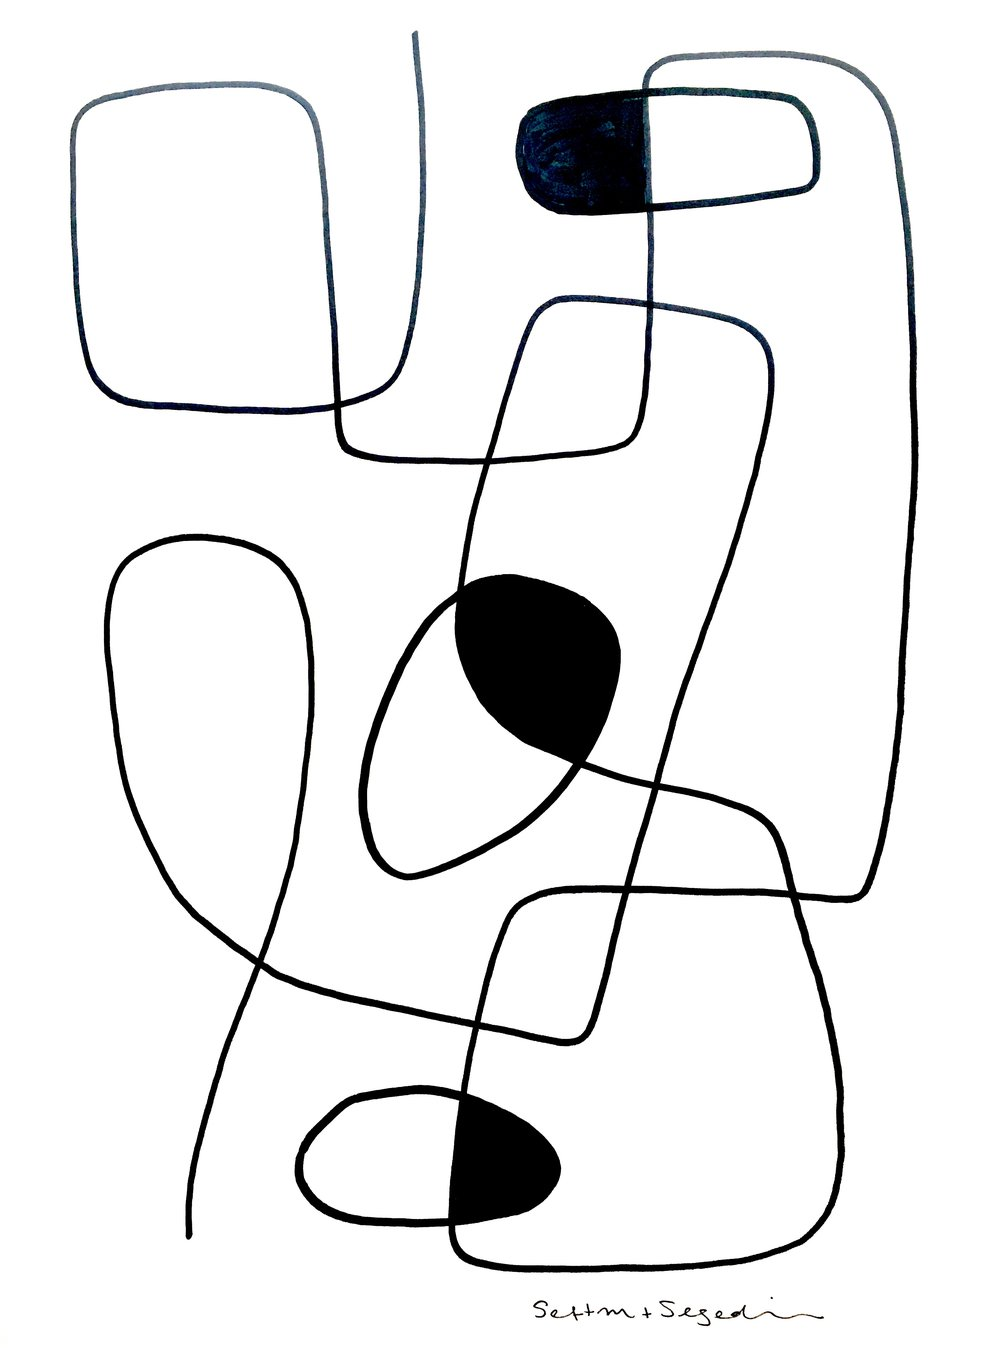 Ceaseless line